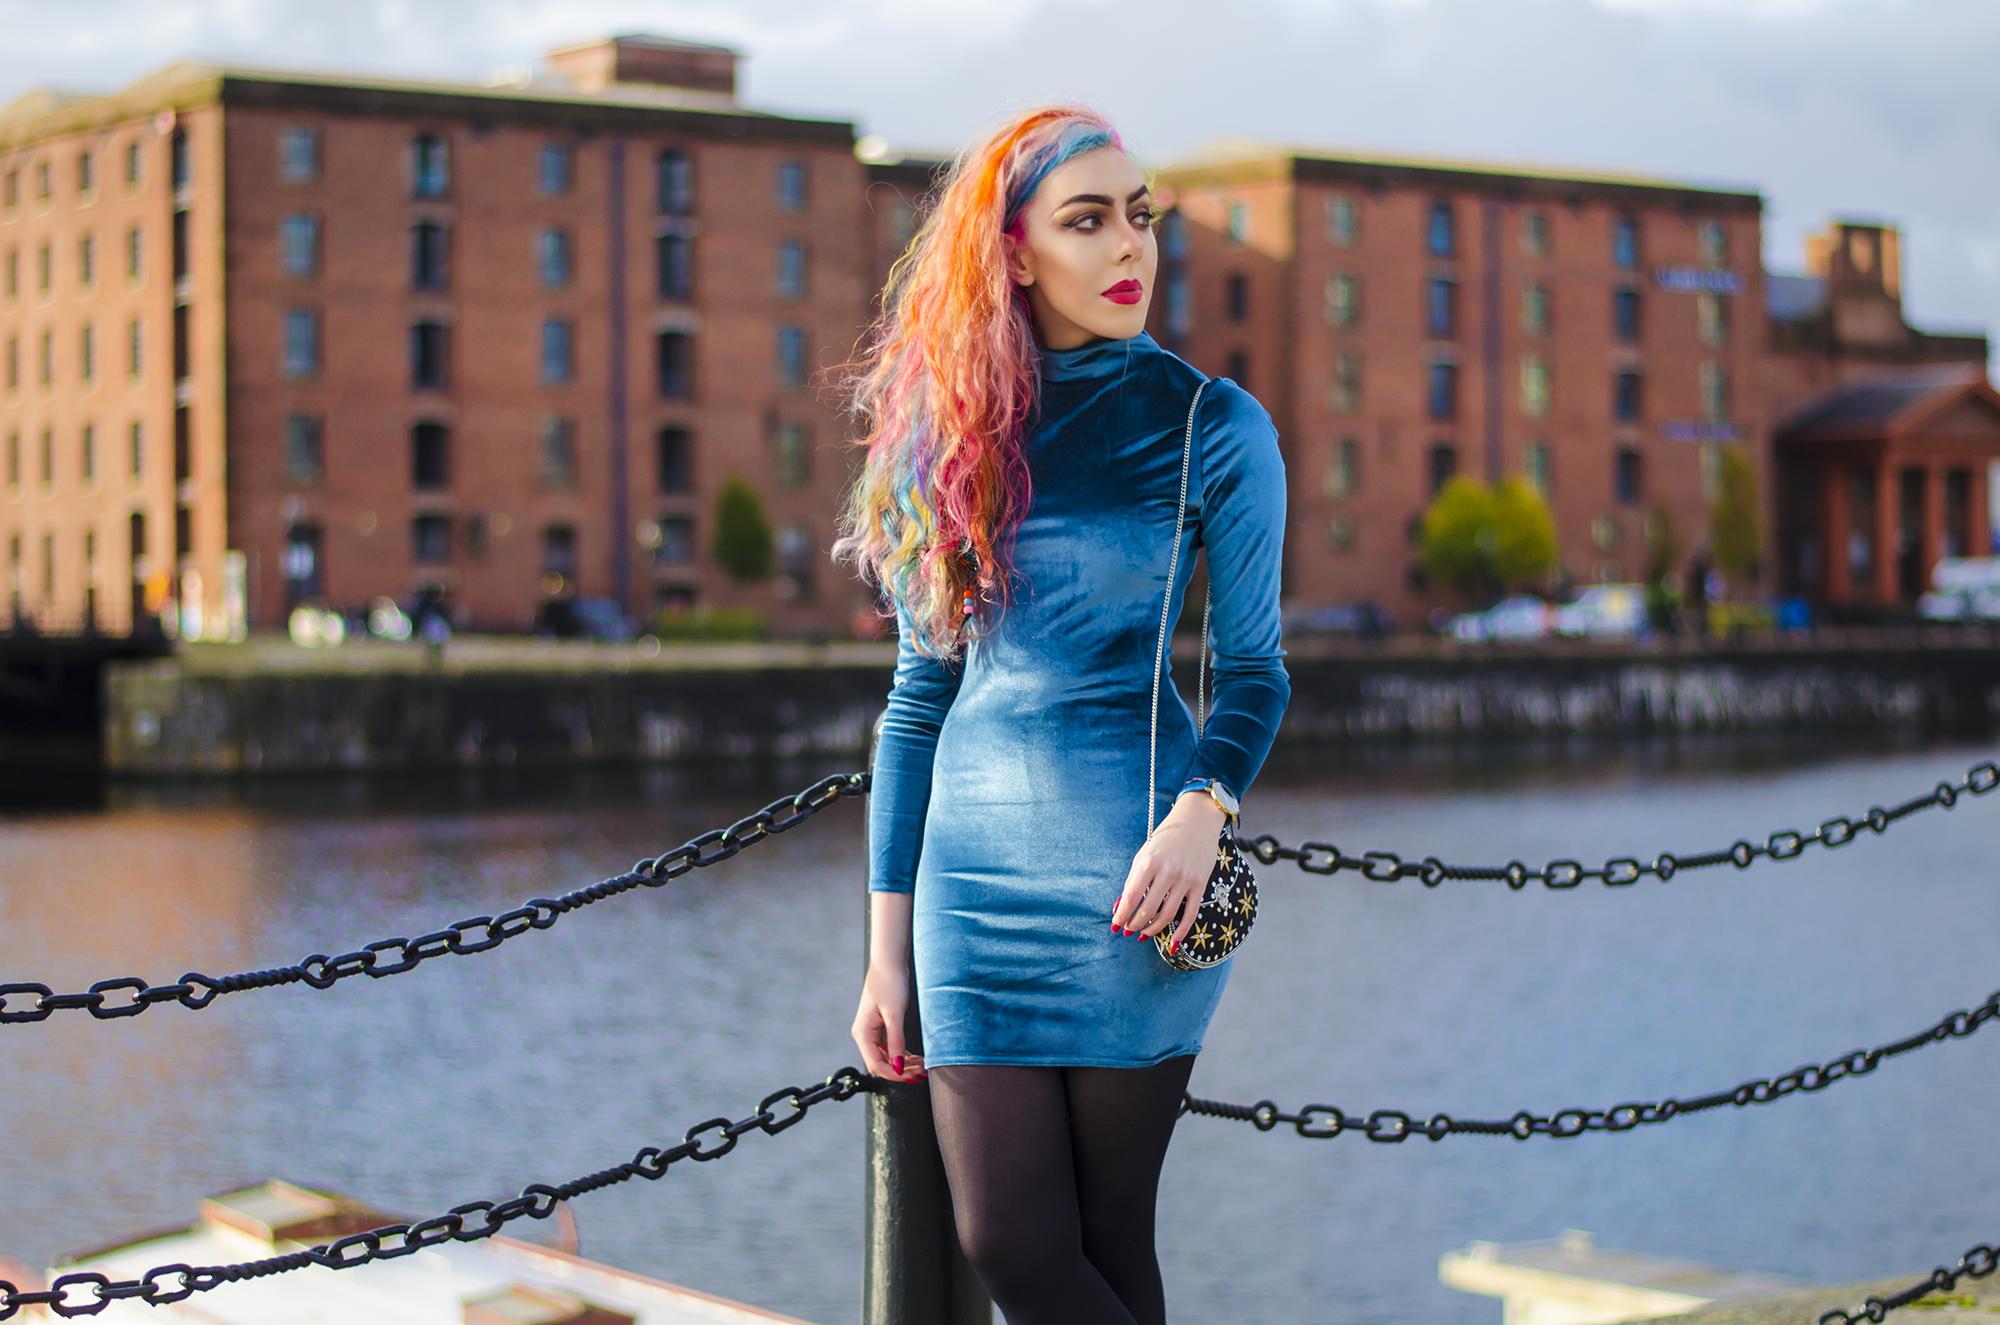 Stephi LaReine rainbow fashion blogger from liverpool wearing blue velvet dress